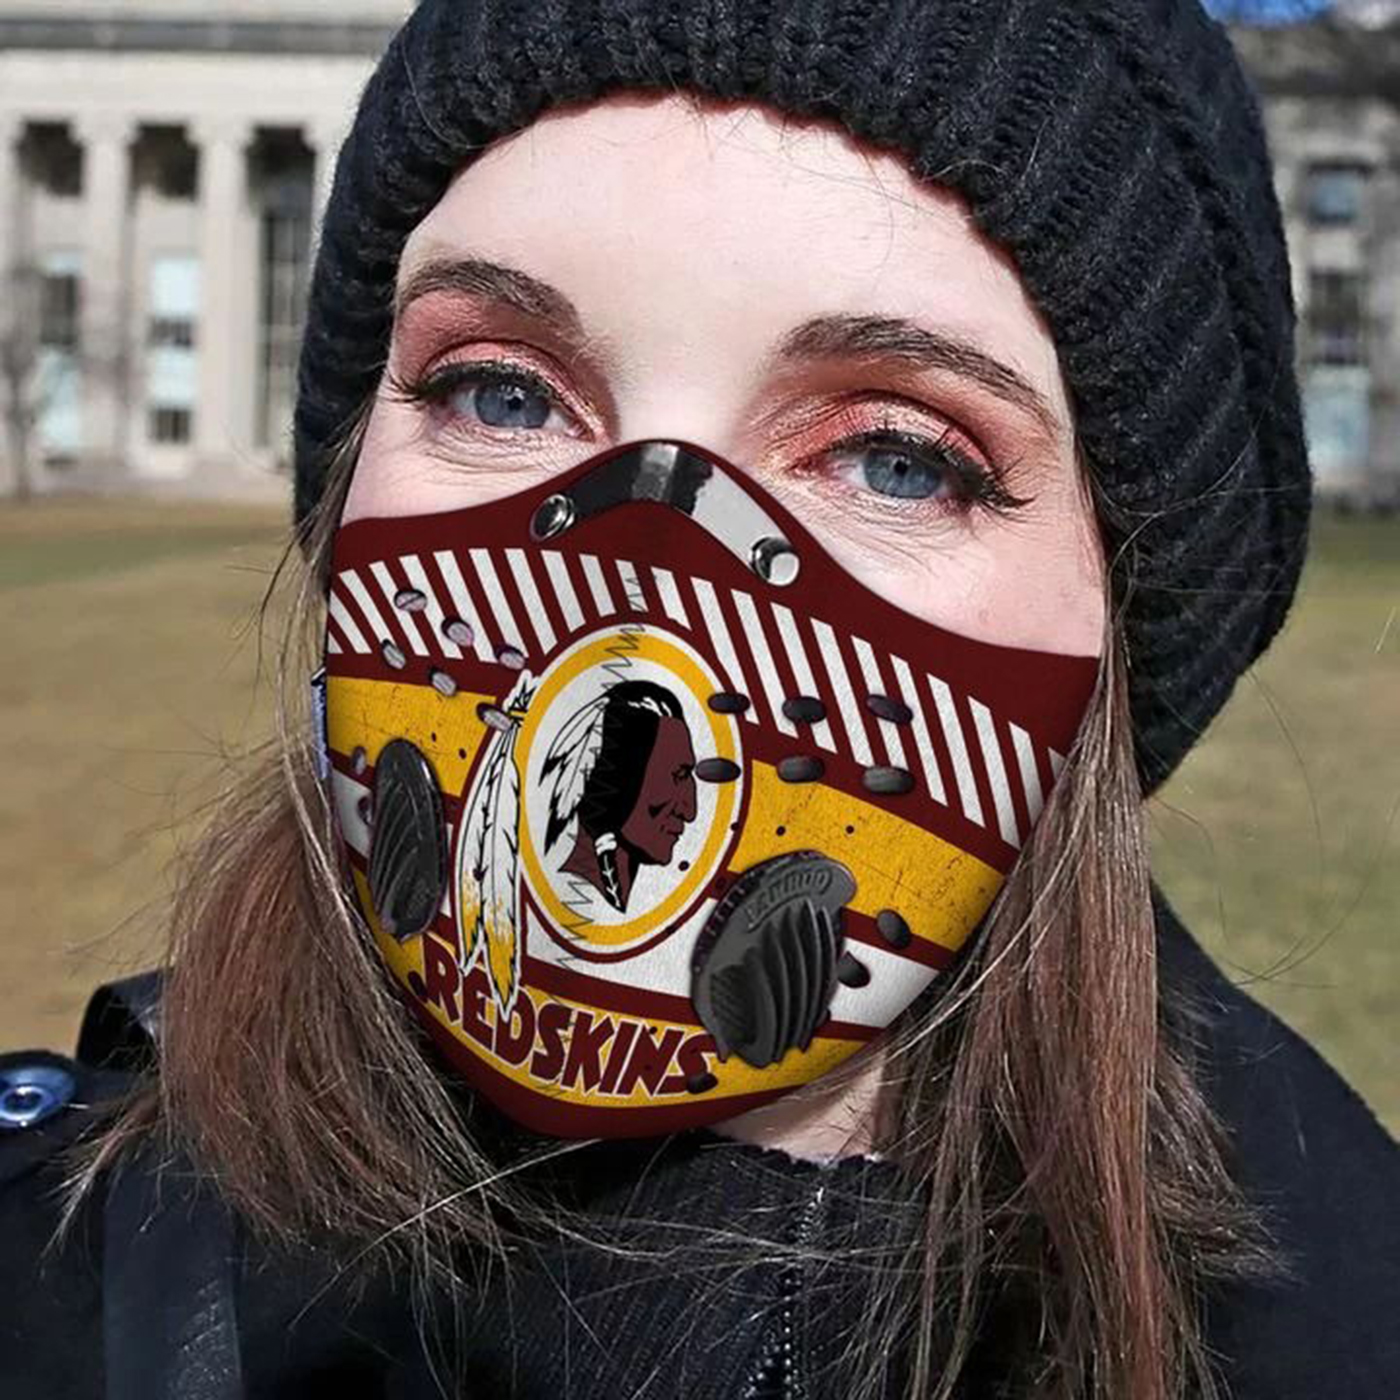 Washington redskins filter face mask - Picture 1